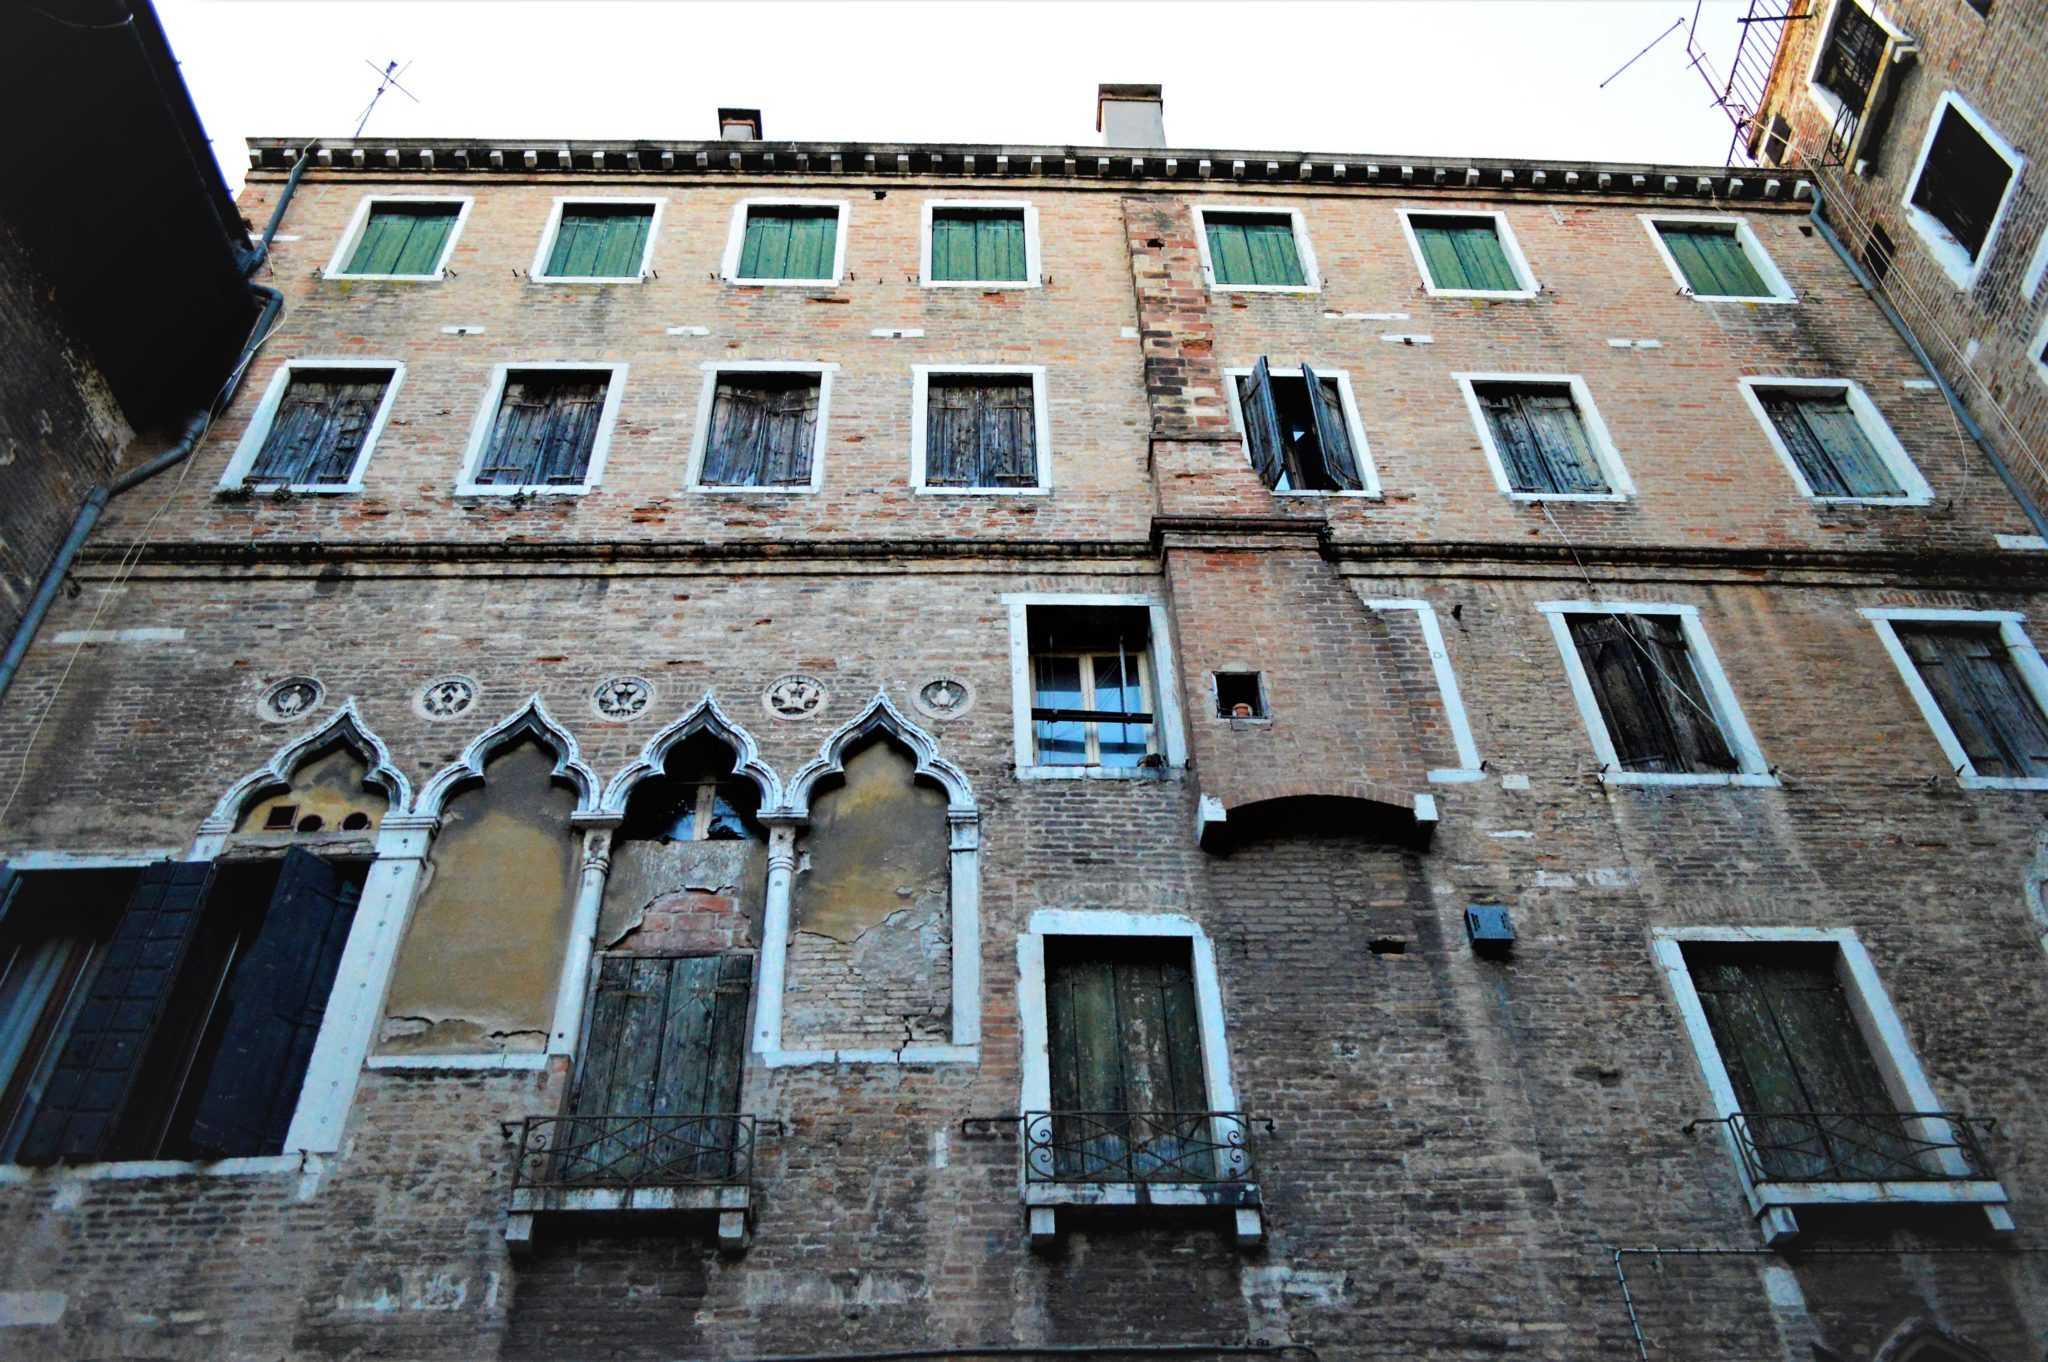 Marco Polo's house, Venice, Italy